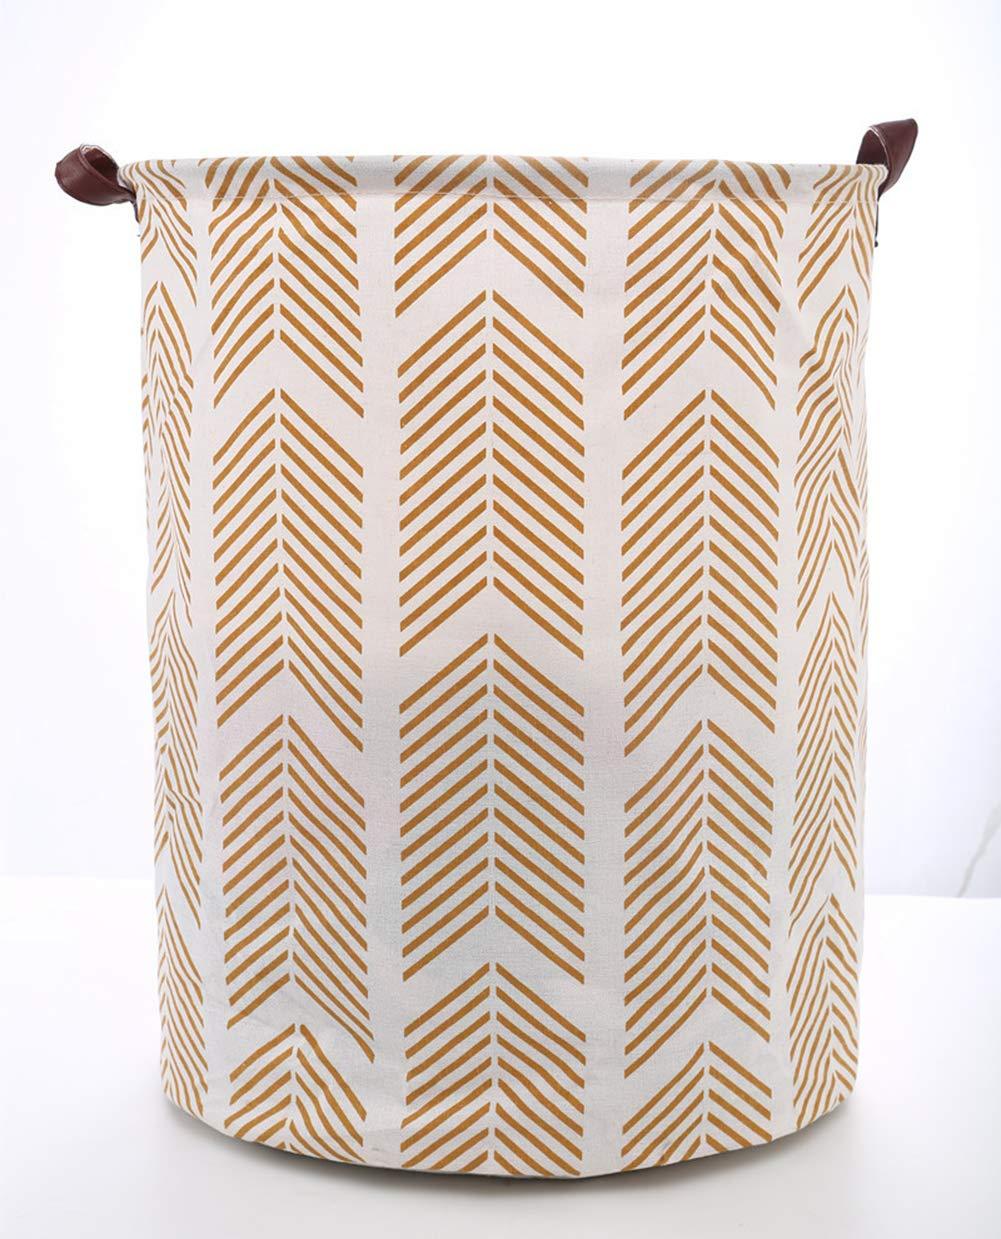 "SuperiMan Gold Pattern Cotton Storage Basket with Leather Handles,Laundry Basket,Toys Organizer Basket 15.7""19.7"" (Gold Arrow)"